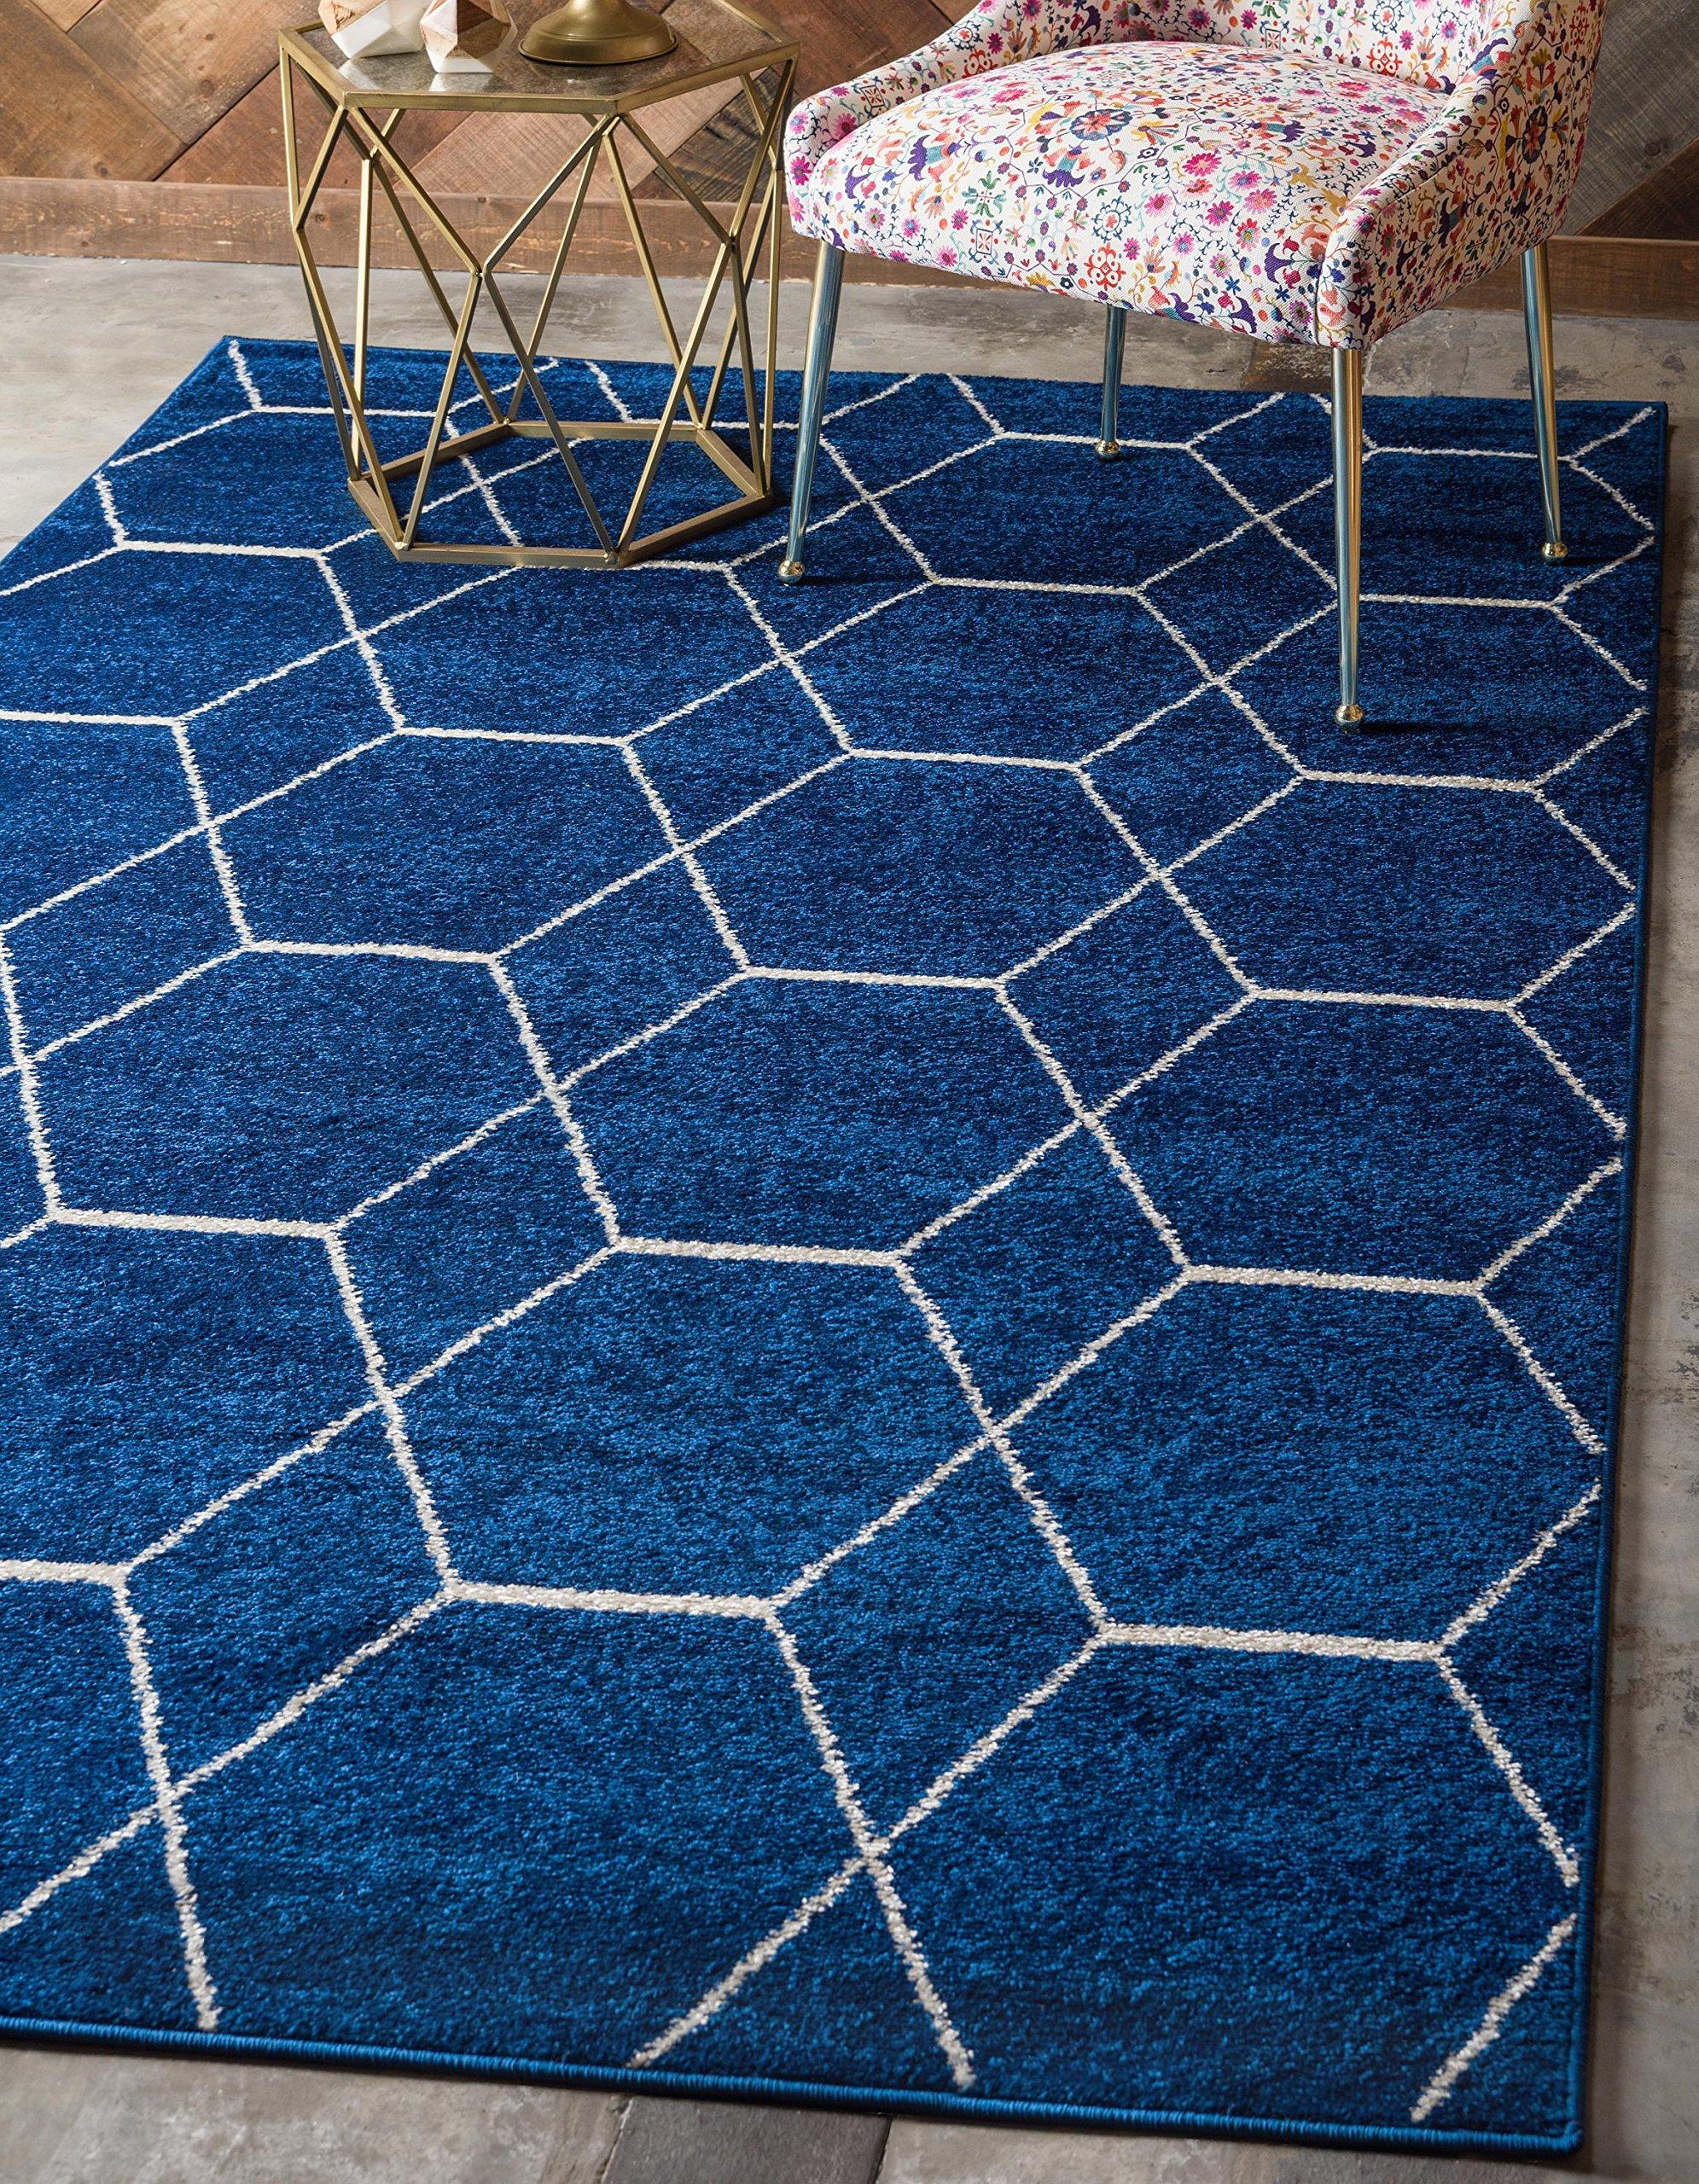 Geometric Pattern Rugs Design Patterns